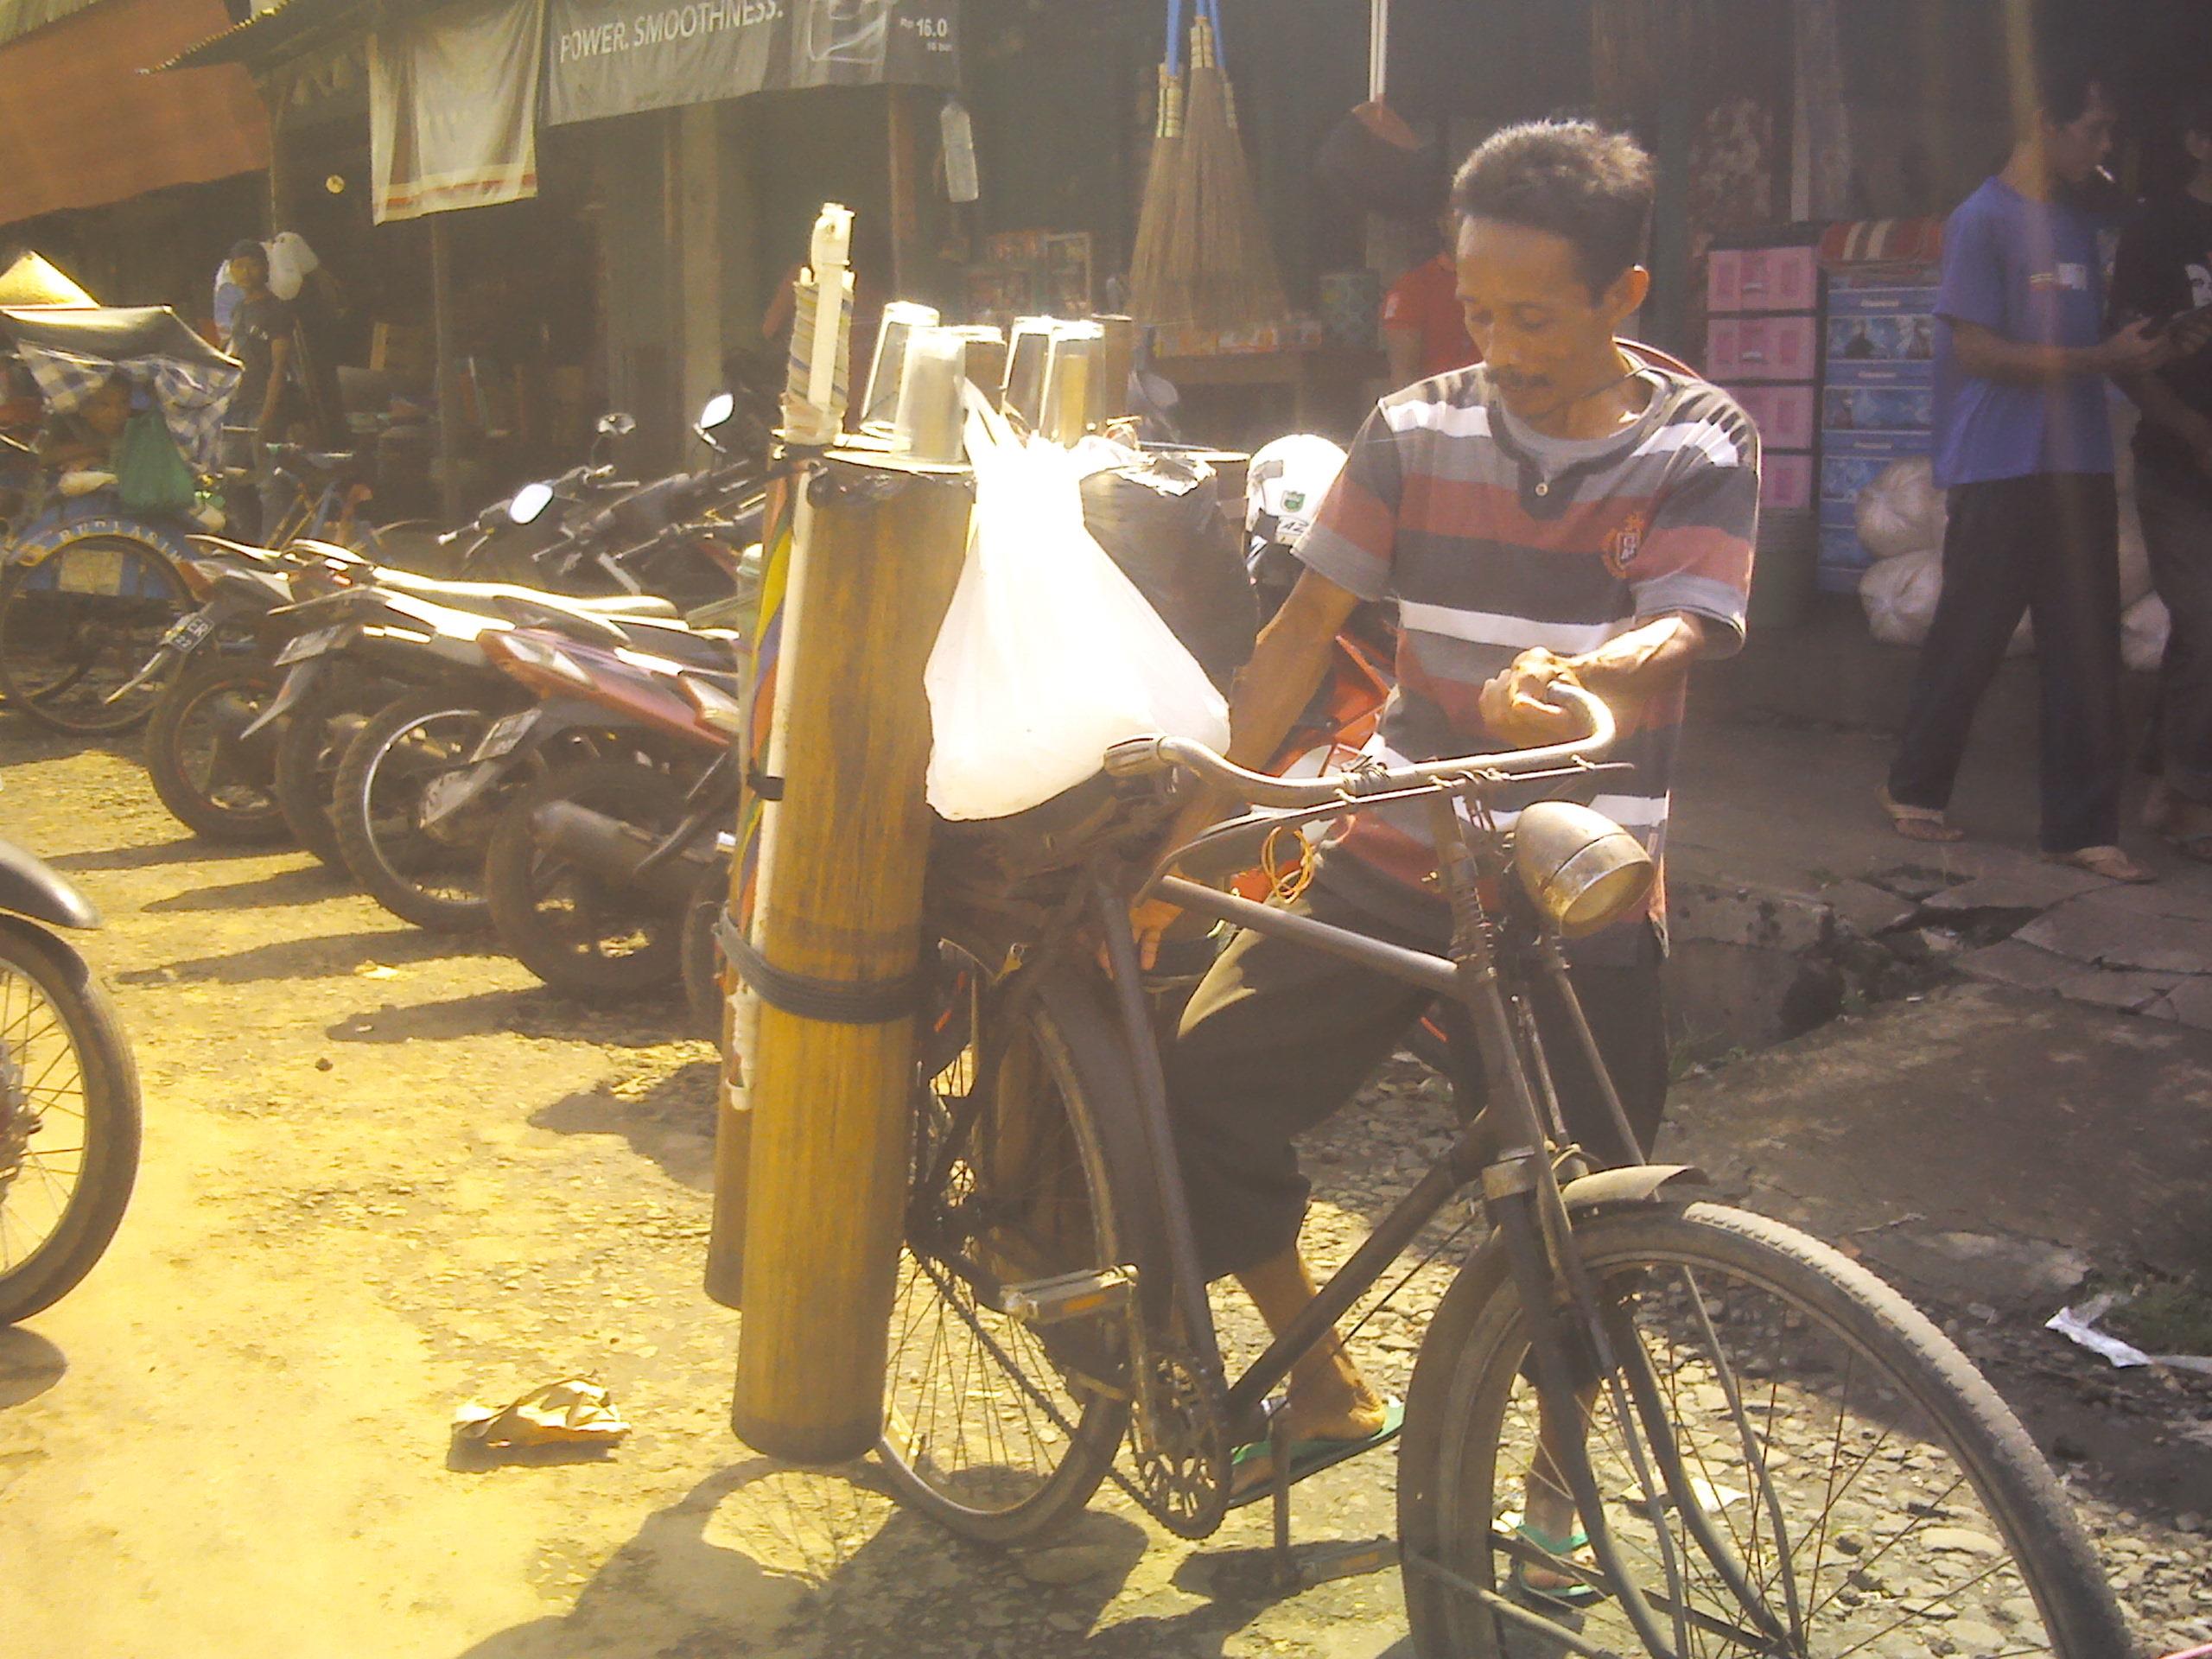 File:Penjual Legen Pasr Sumpiuh, Banyumas.jpg